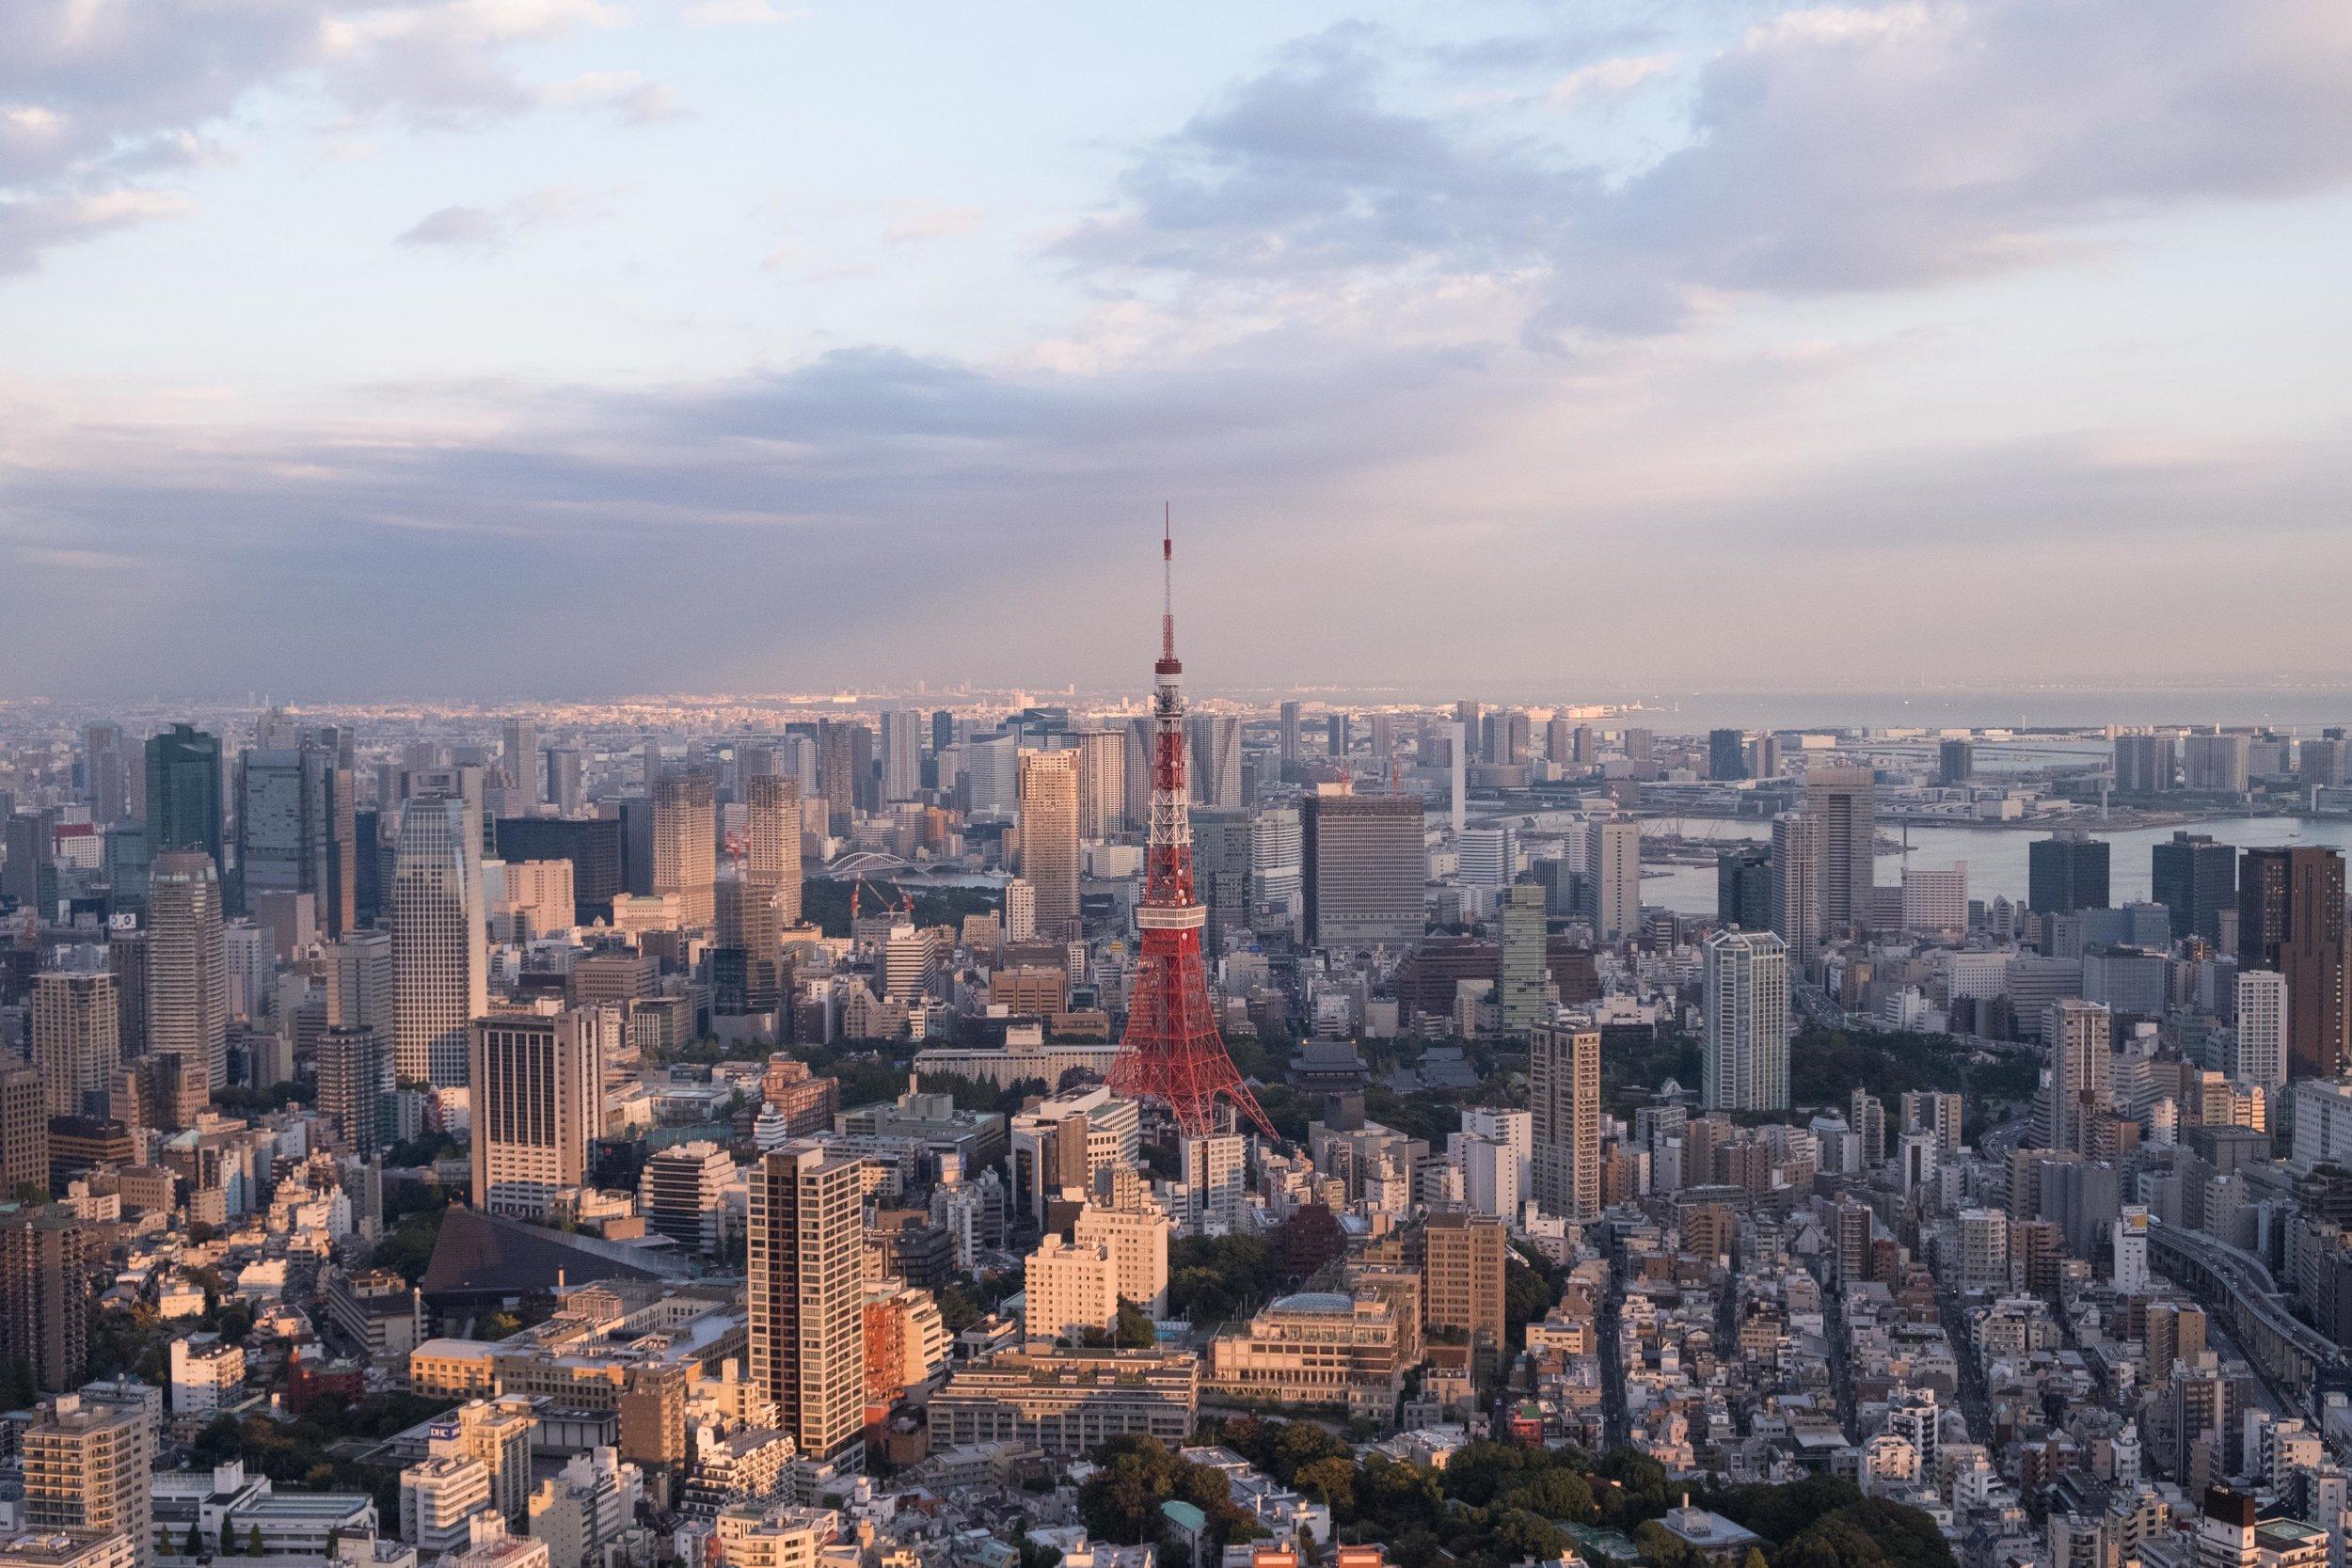 tokyo week 4: Minions, Mullets, and Mind-blowing sushi - November 3rd, 2017